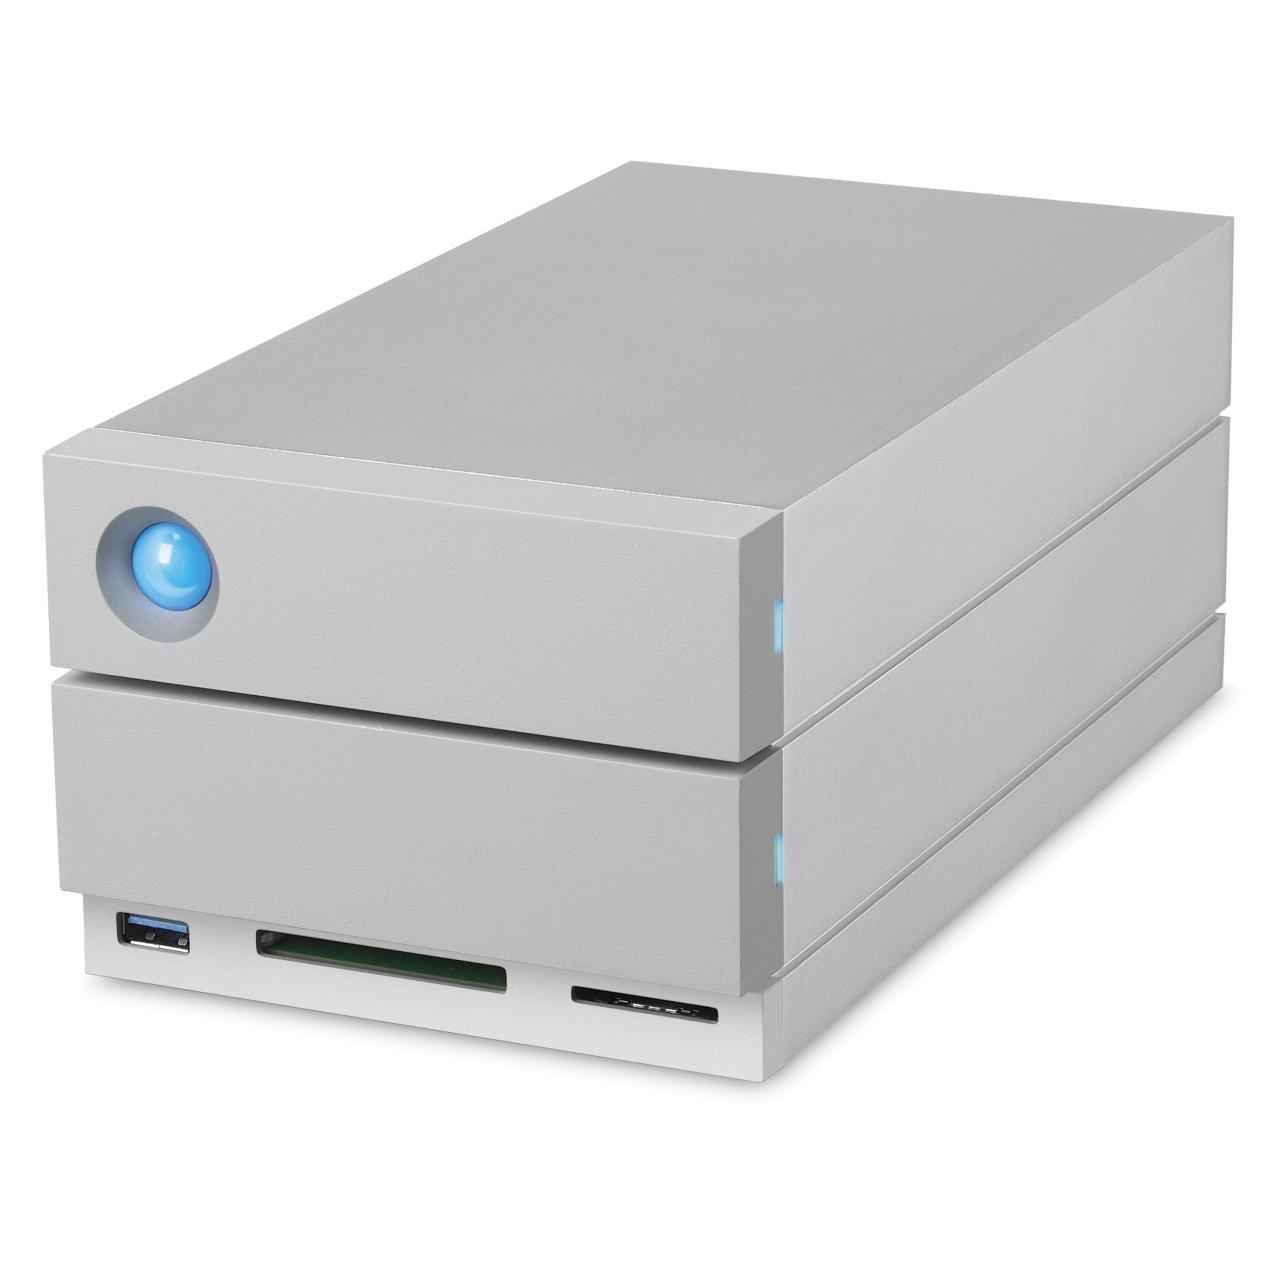 LaCie 2big Dock Thunderbolt 3 20 TB 2 x 10 TB STGB20000400